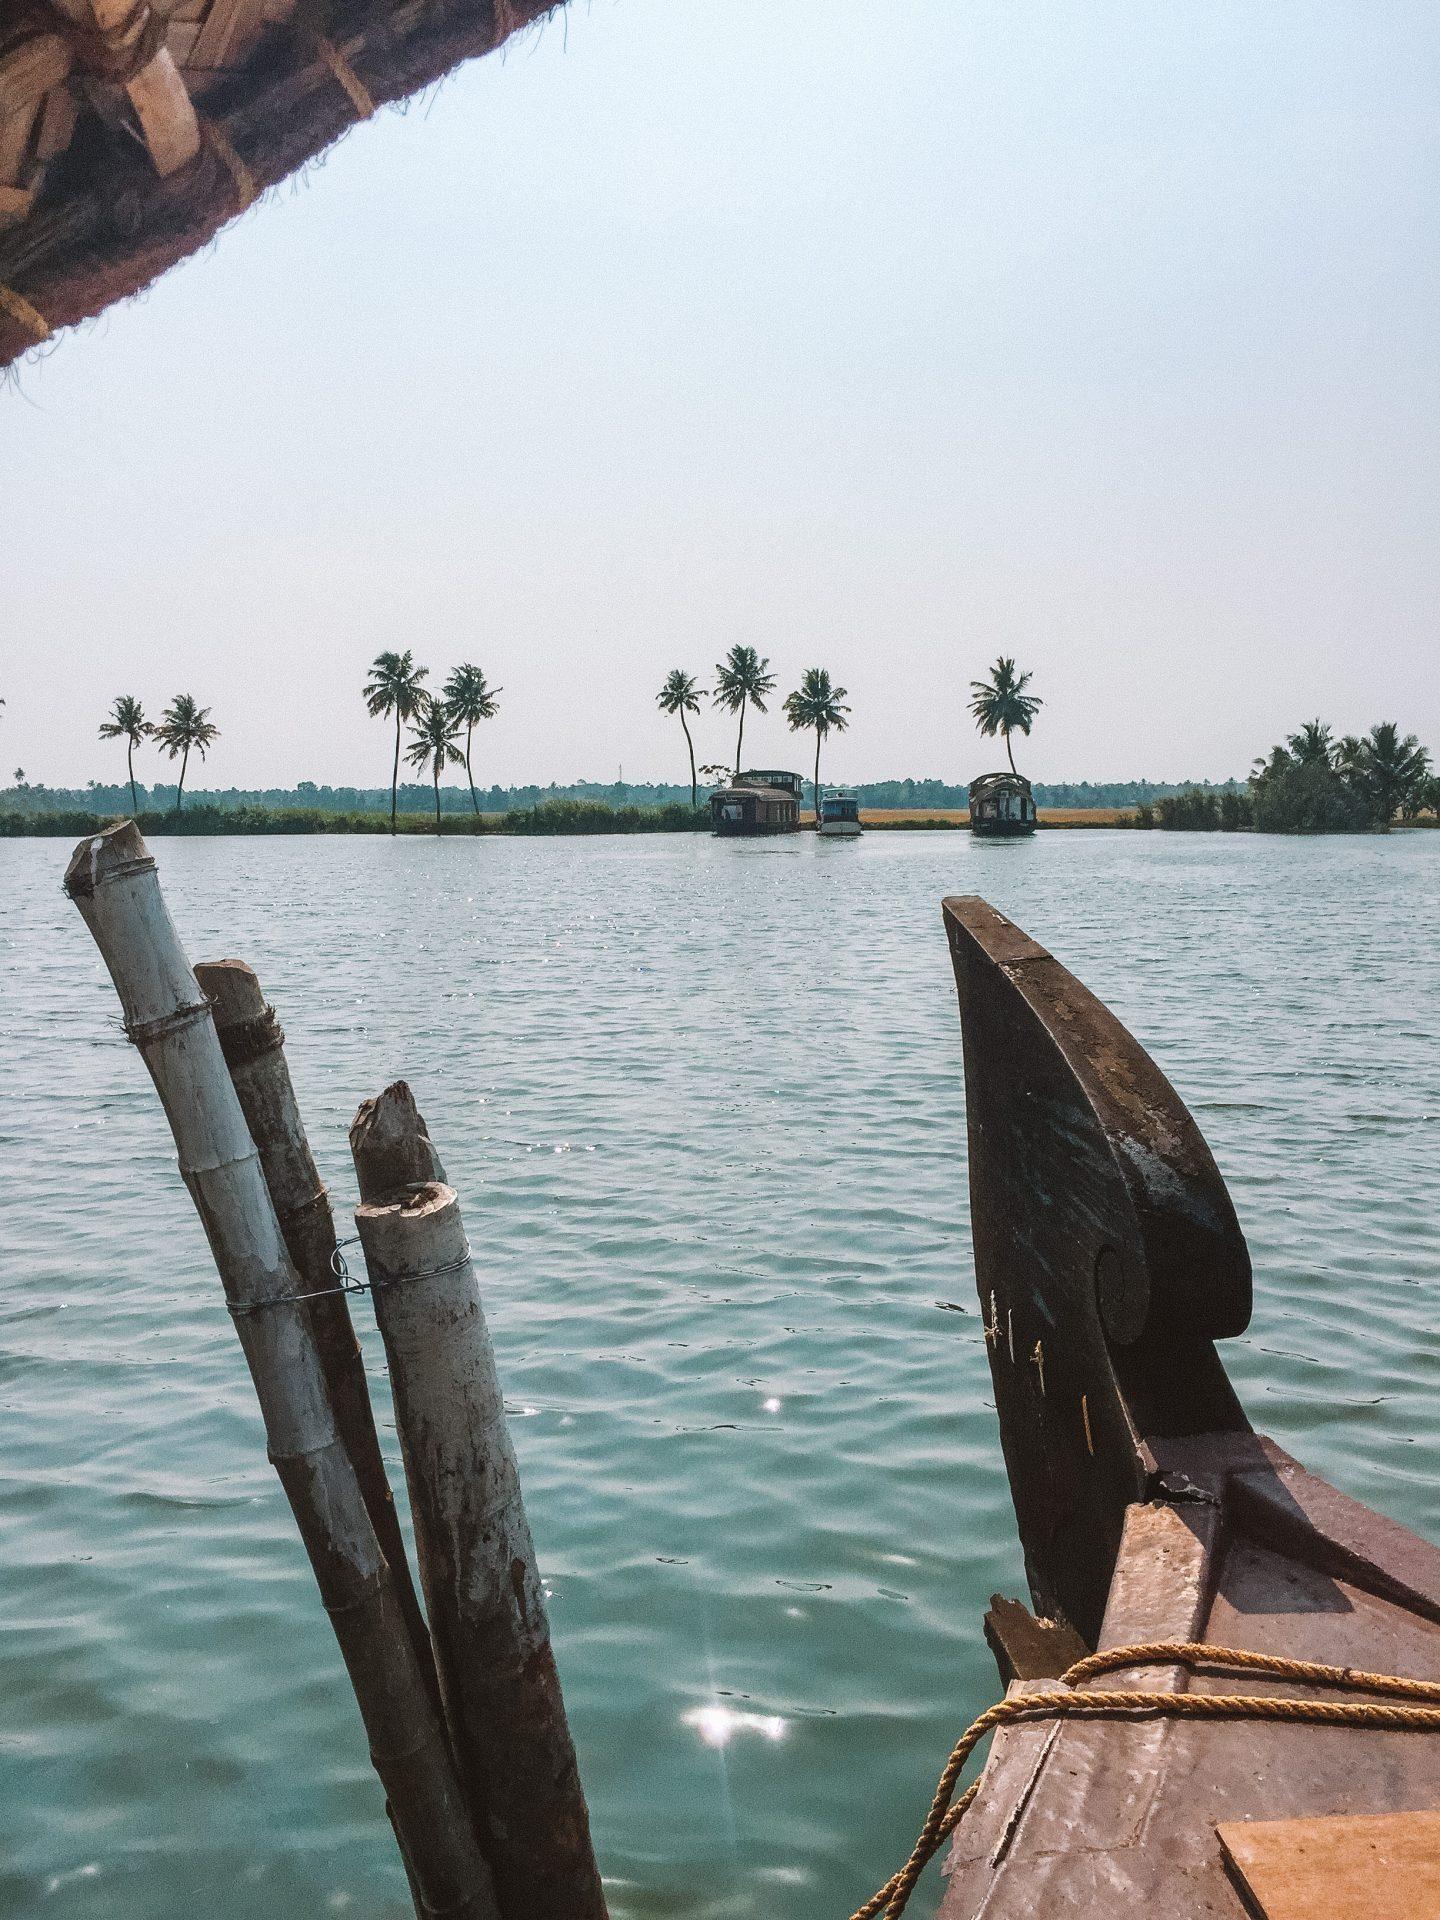 kerala backwaters reflection